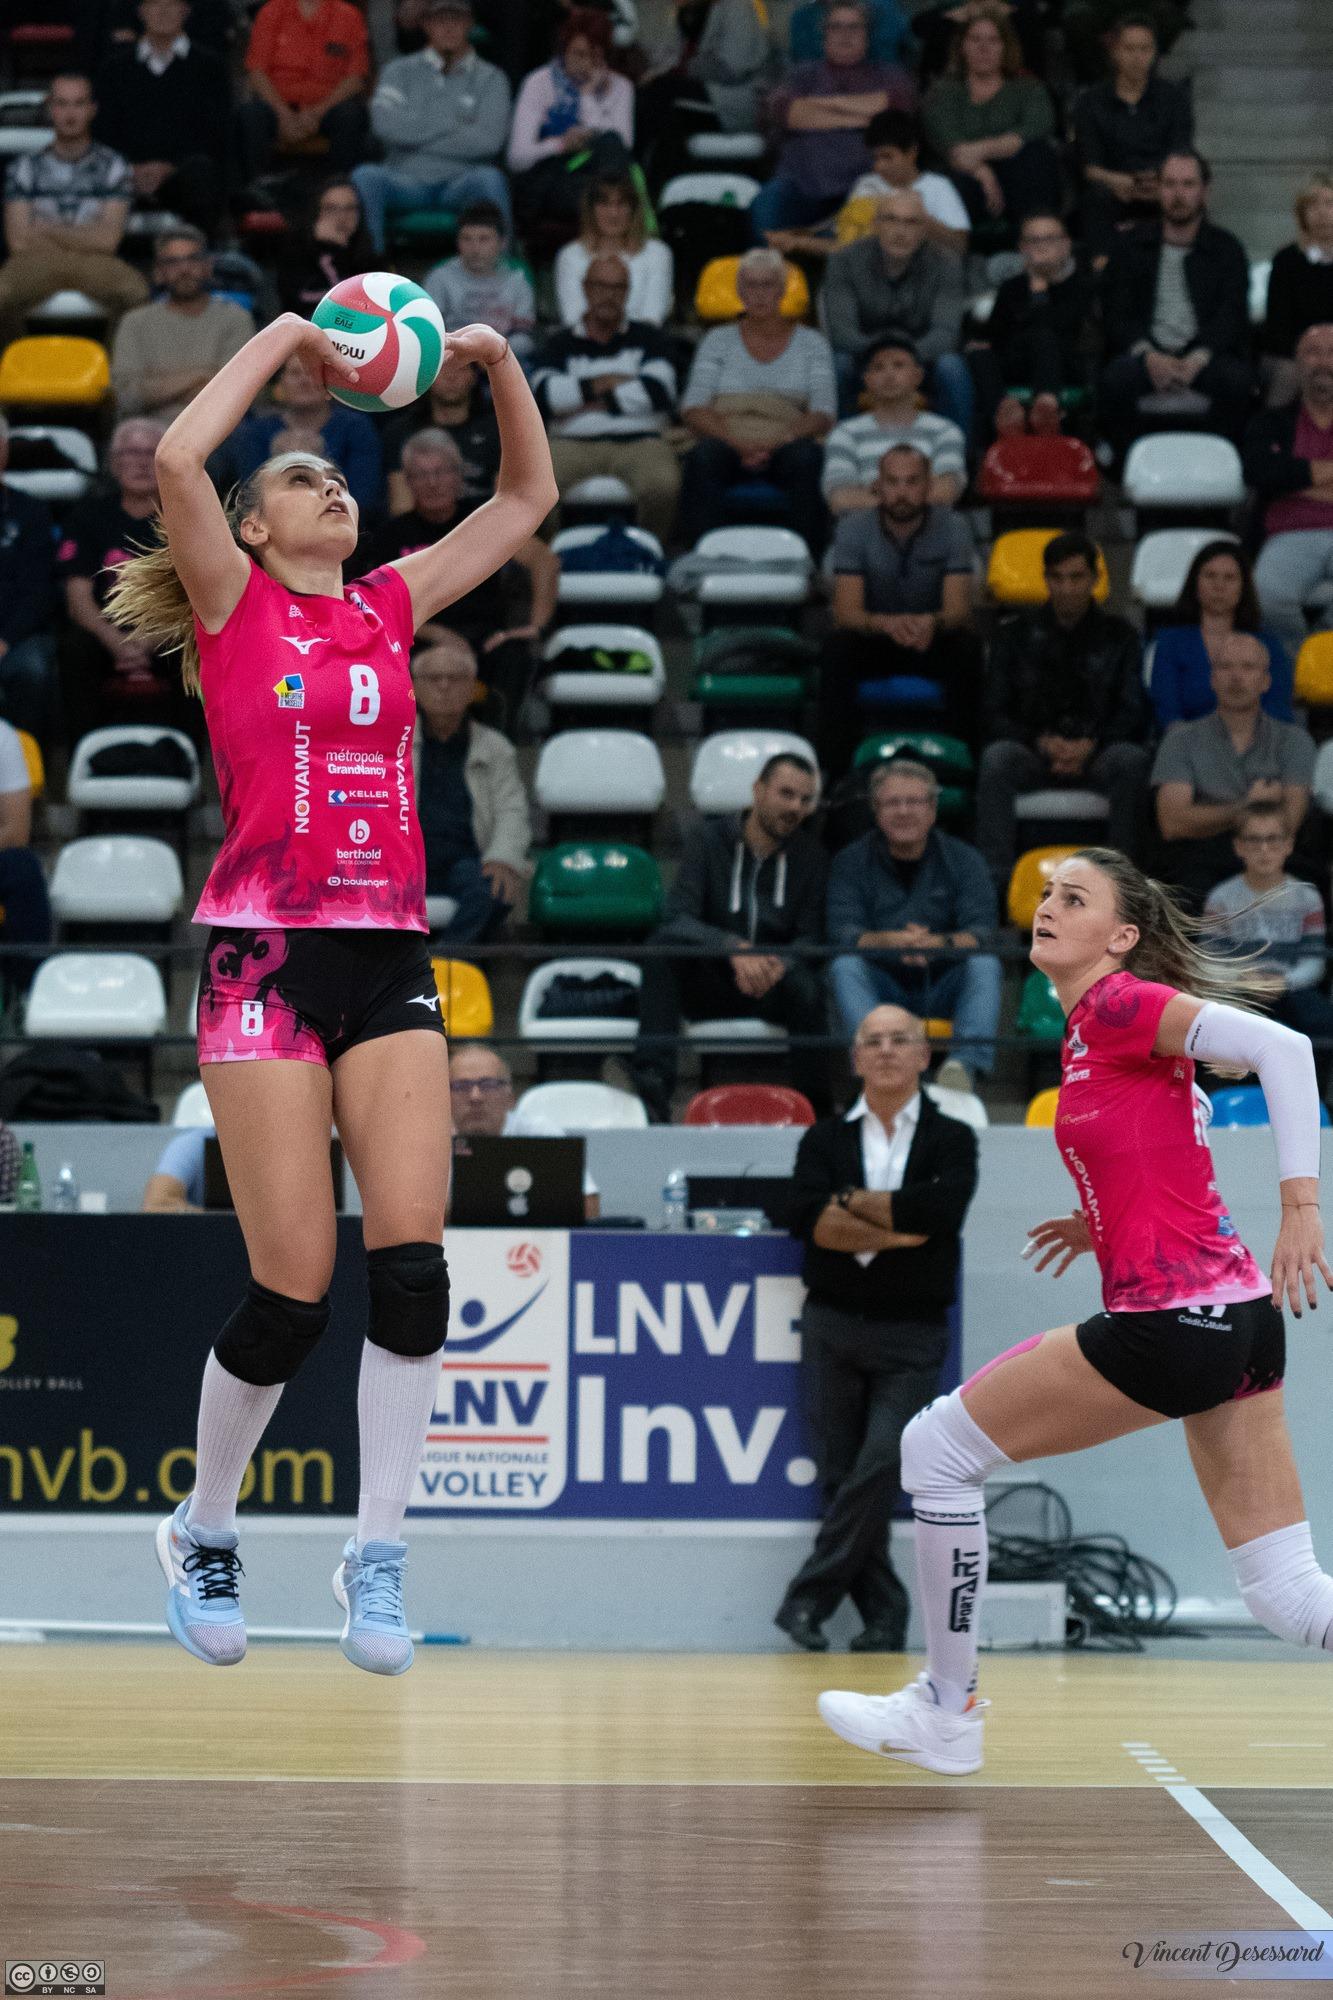 maillot-volley-LAF-2019-2020-VNVB-mizuno-2